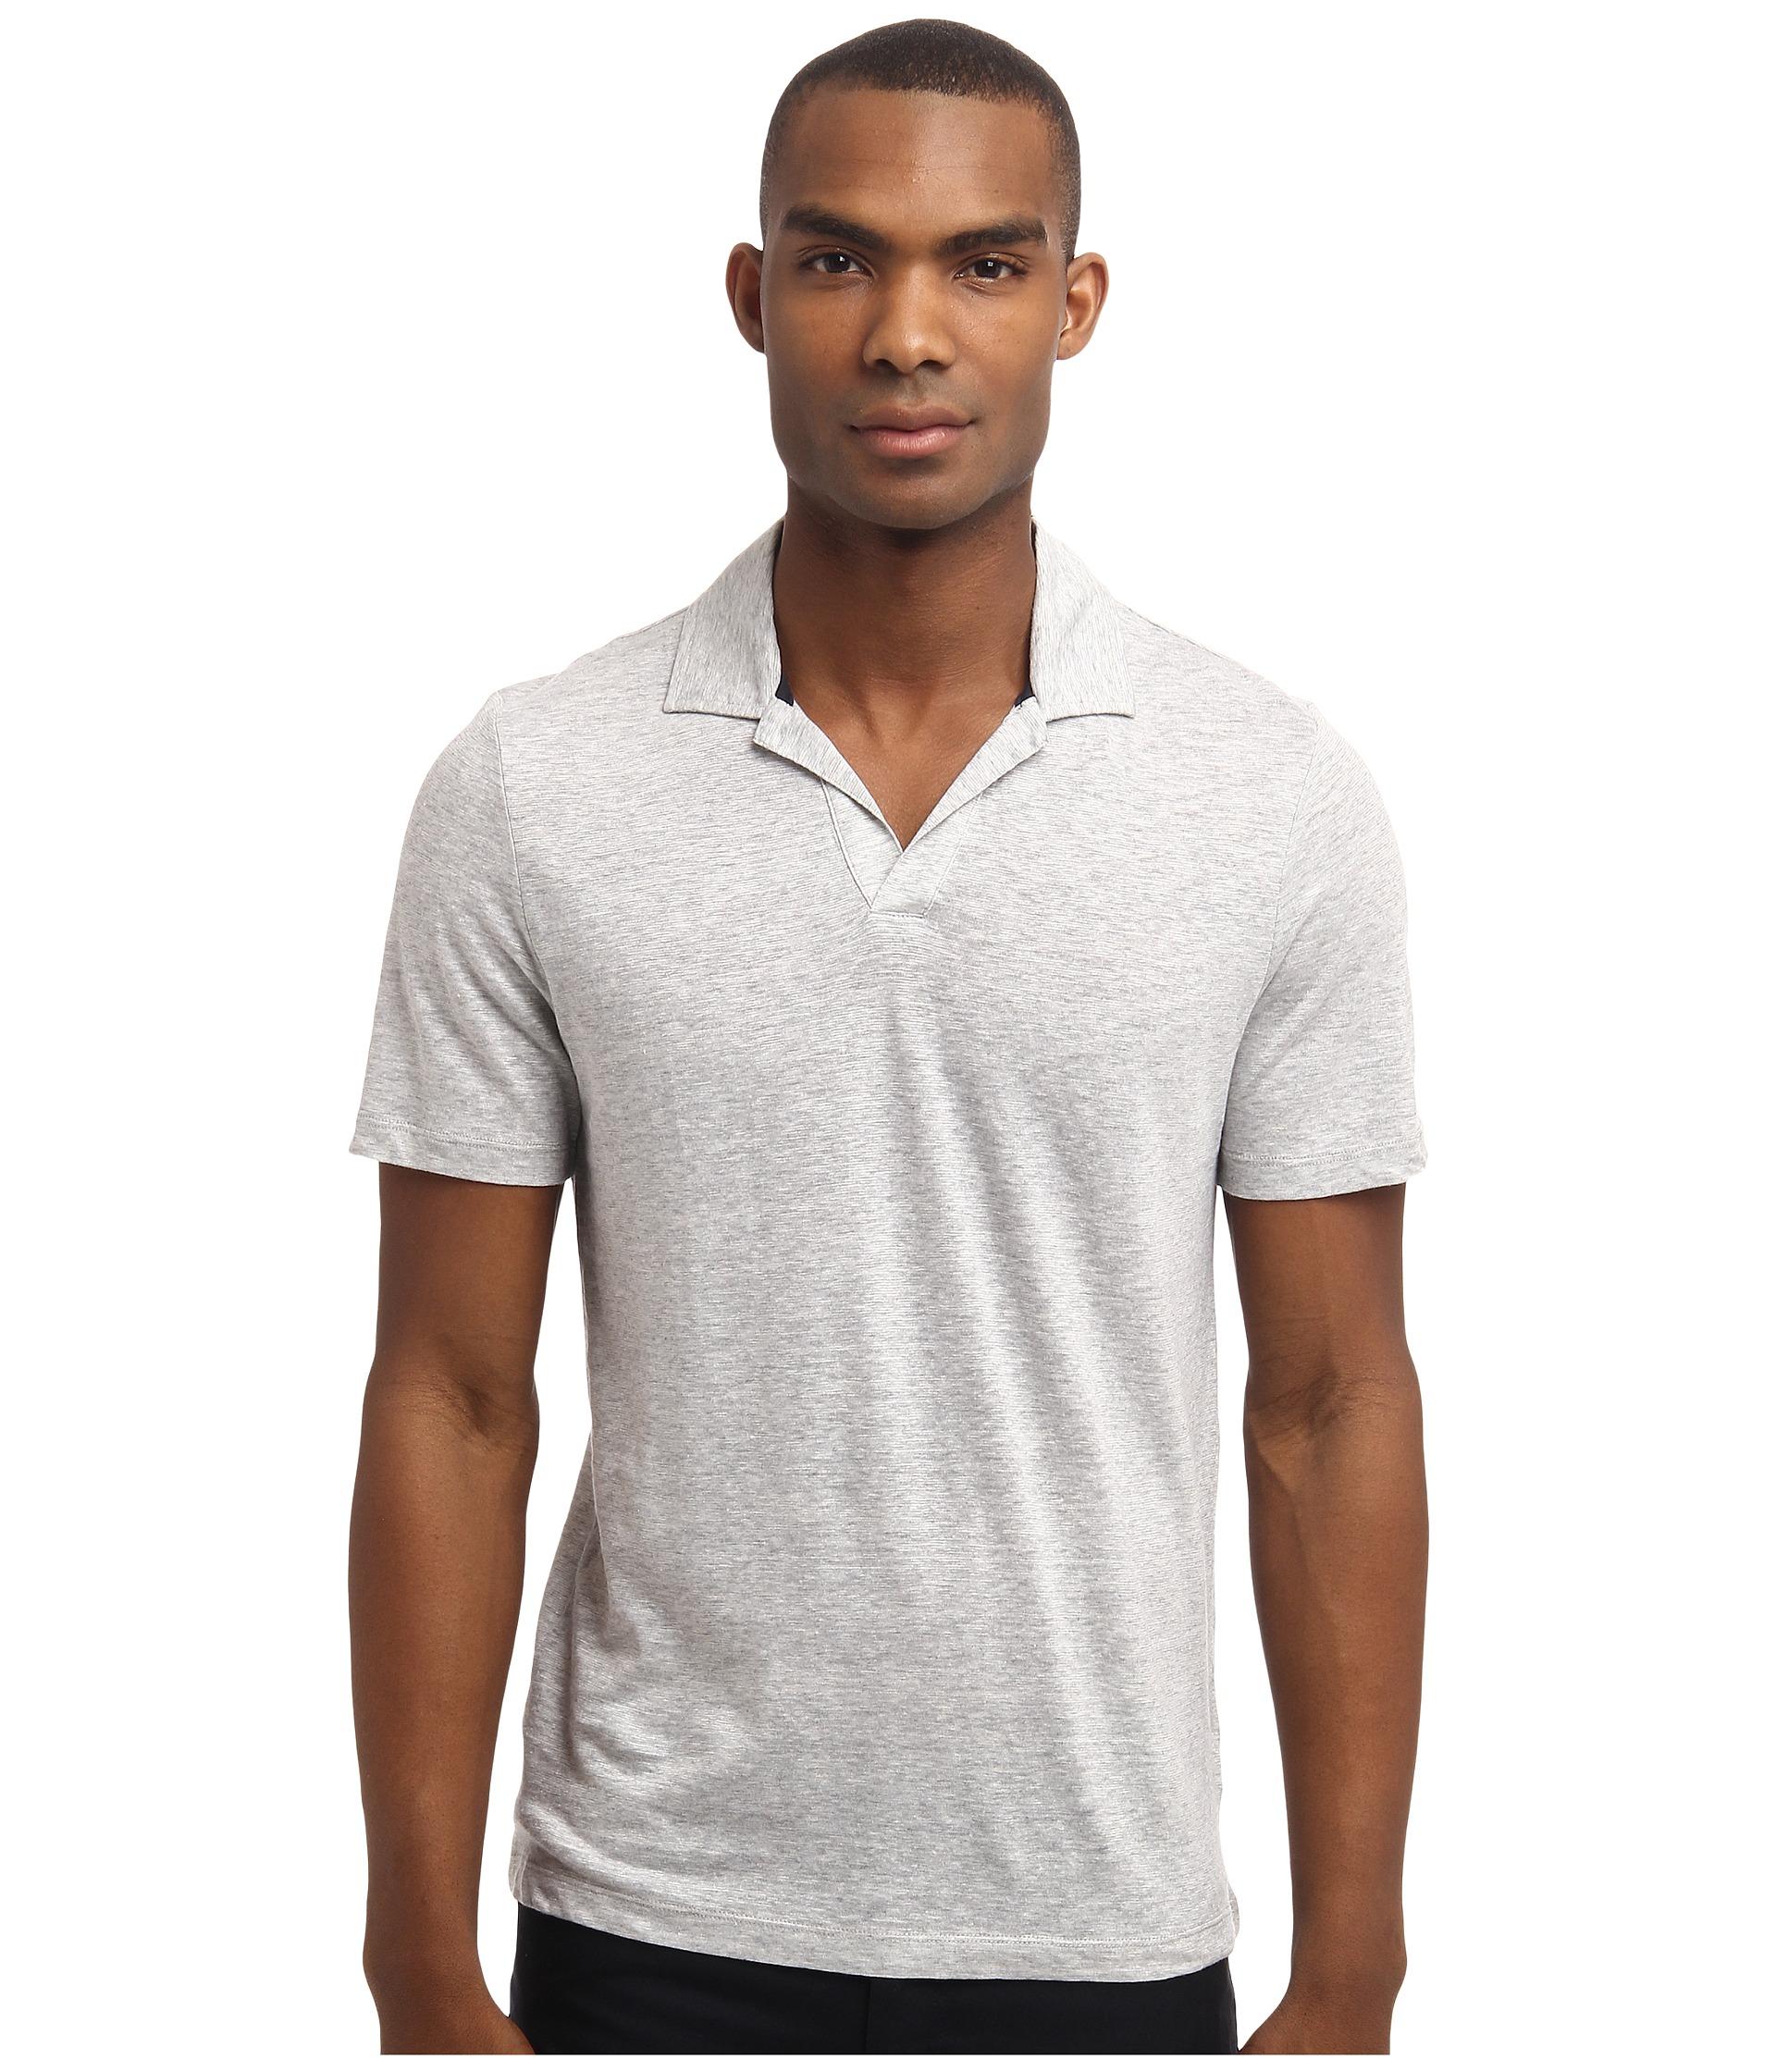 Michael Kors T Shirt Mens